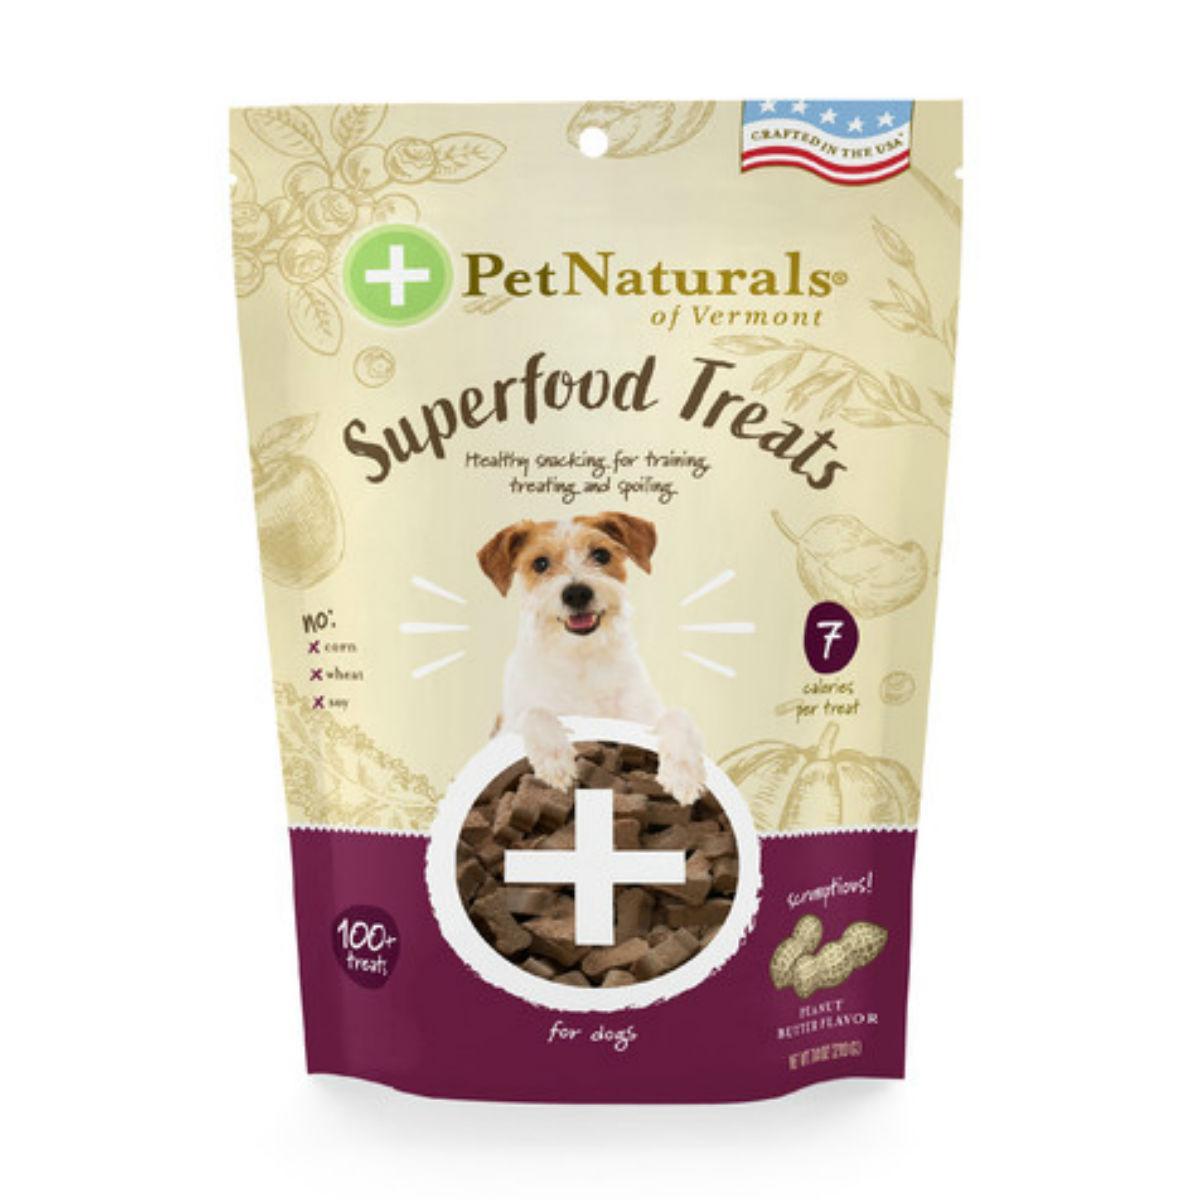 Pet Naturals Superfood Dog Treats - Peanut Butter Flavor